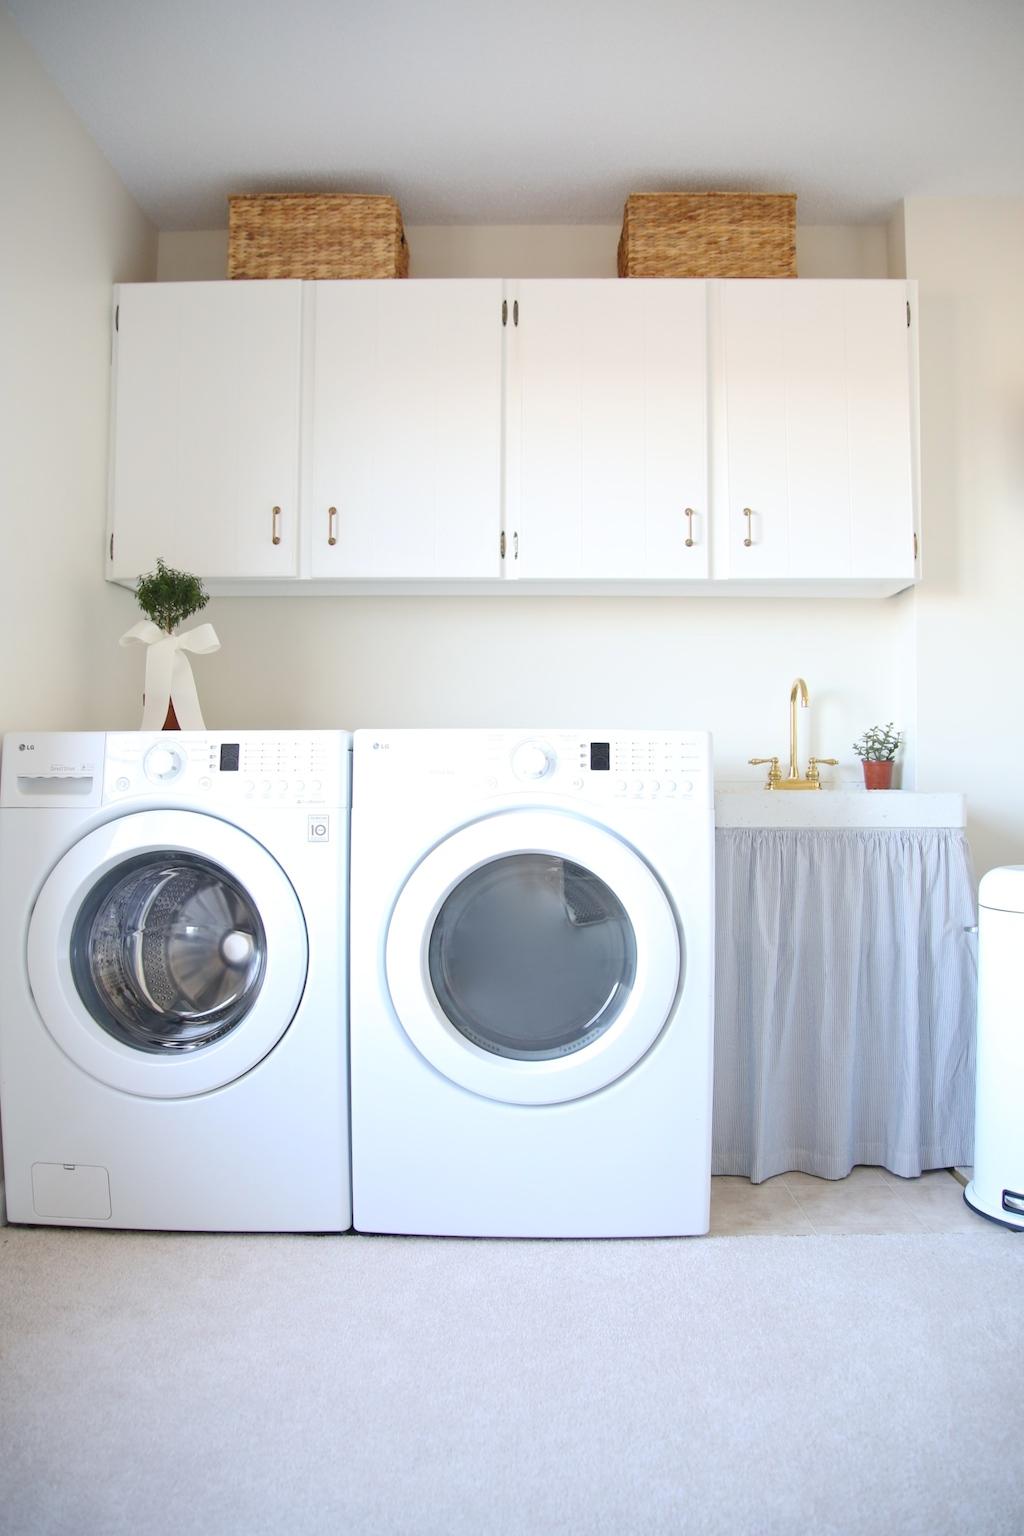 25 Small Laundry Room Ideas on Laundry Decoration  id=97552